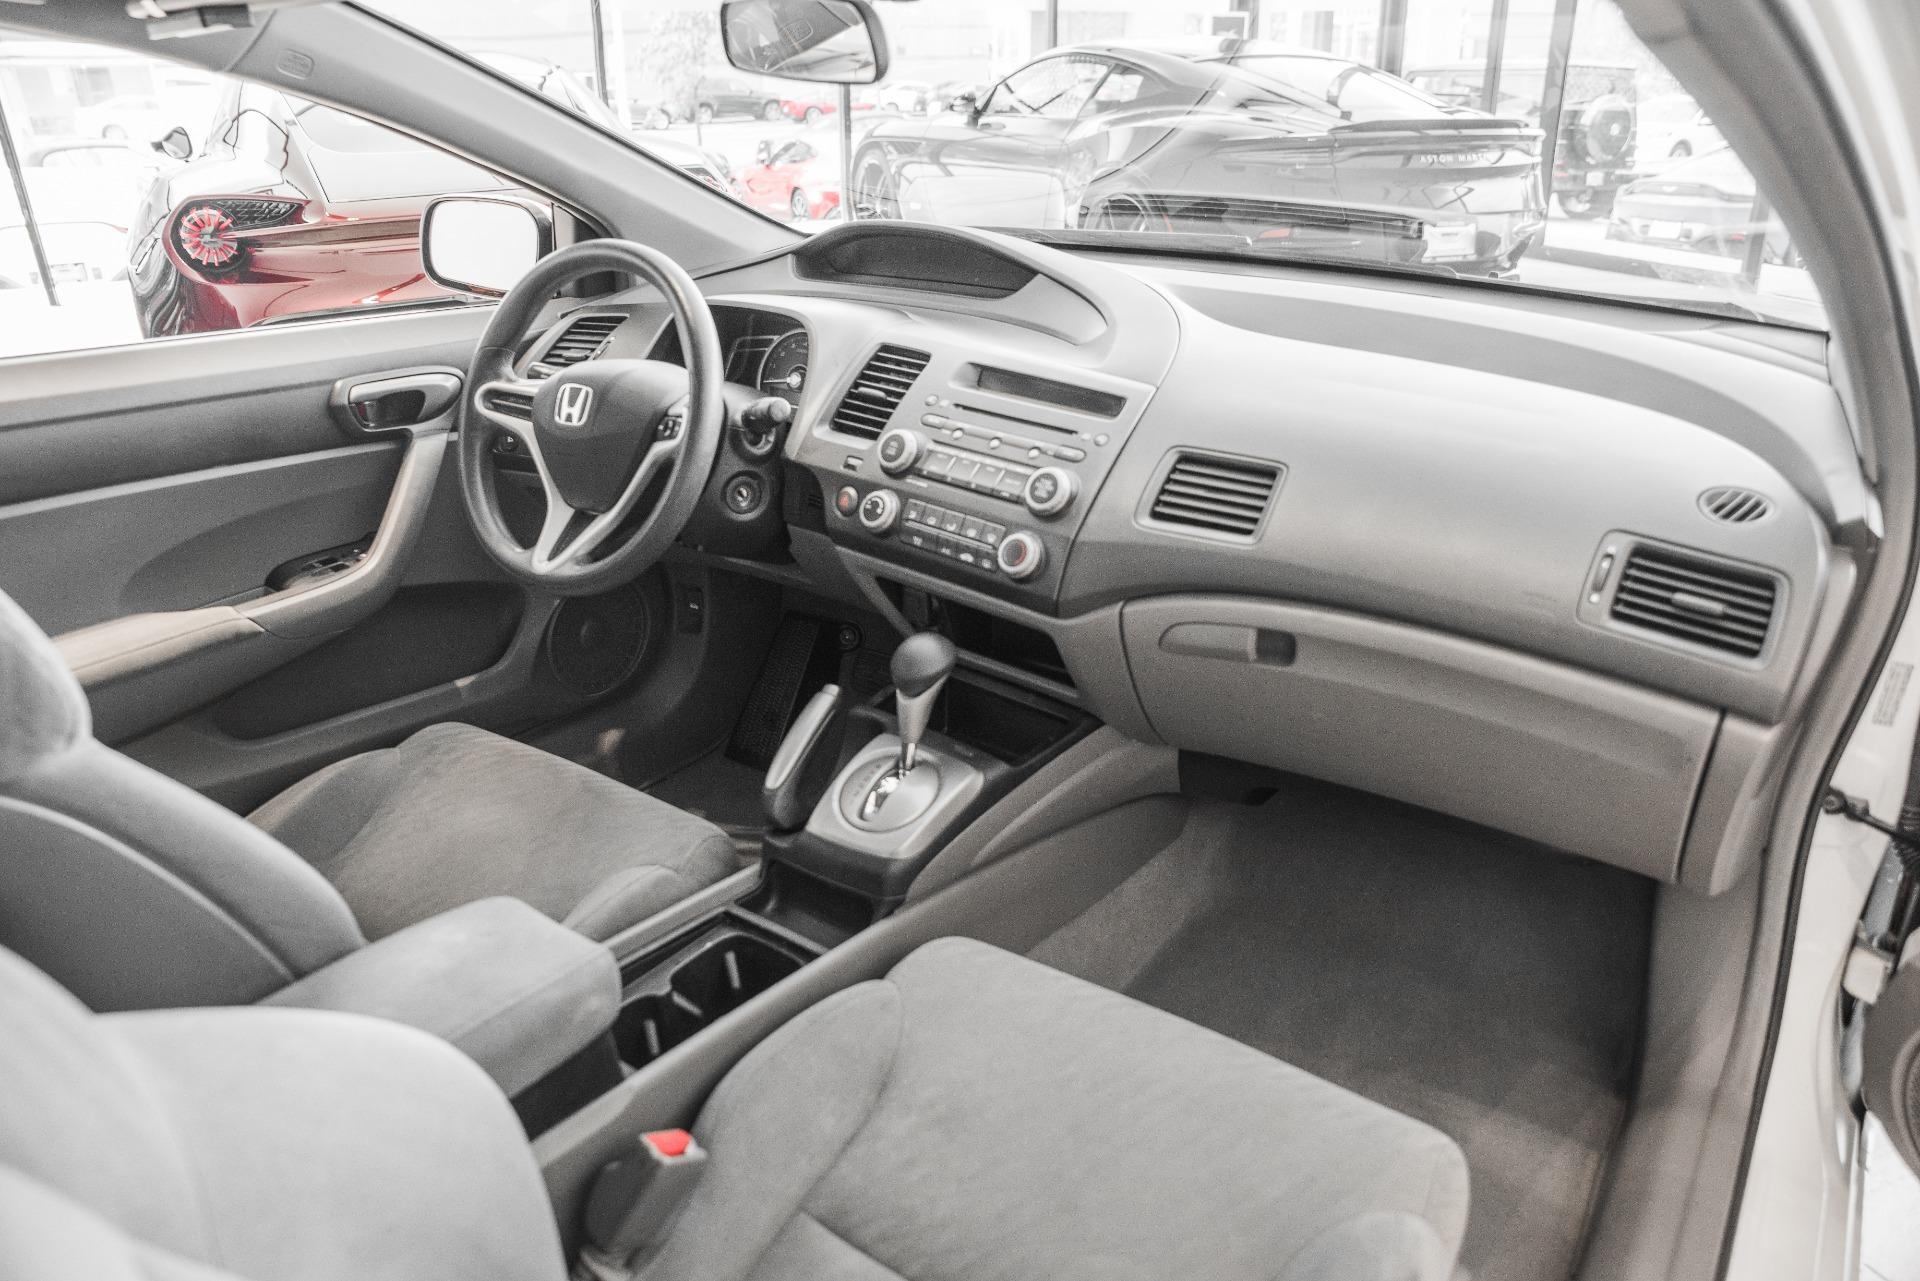 Used-2010-Honda-Civic-Cpe-LX